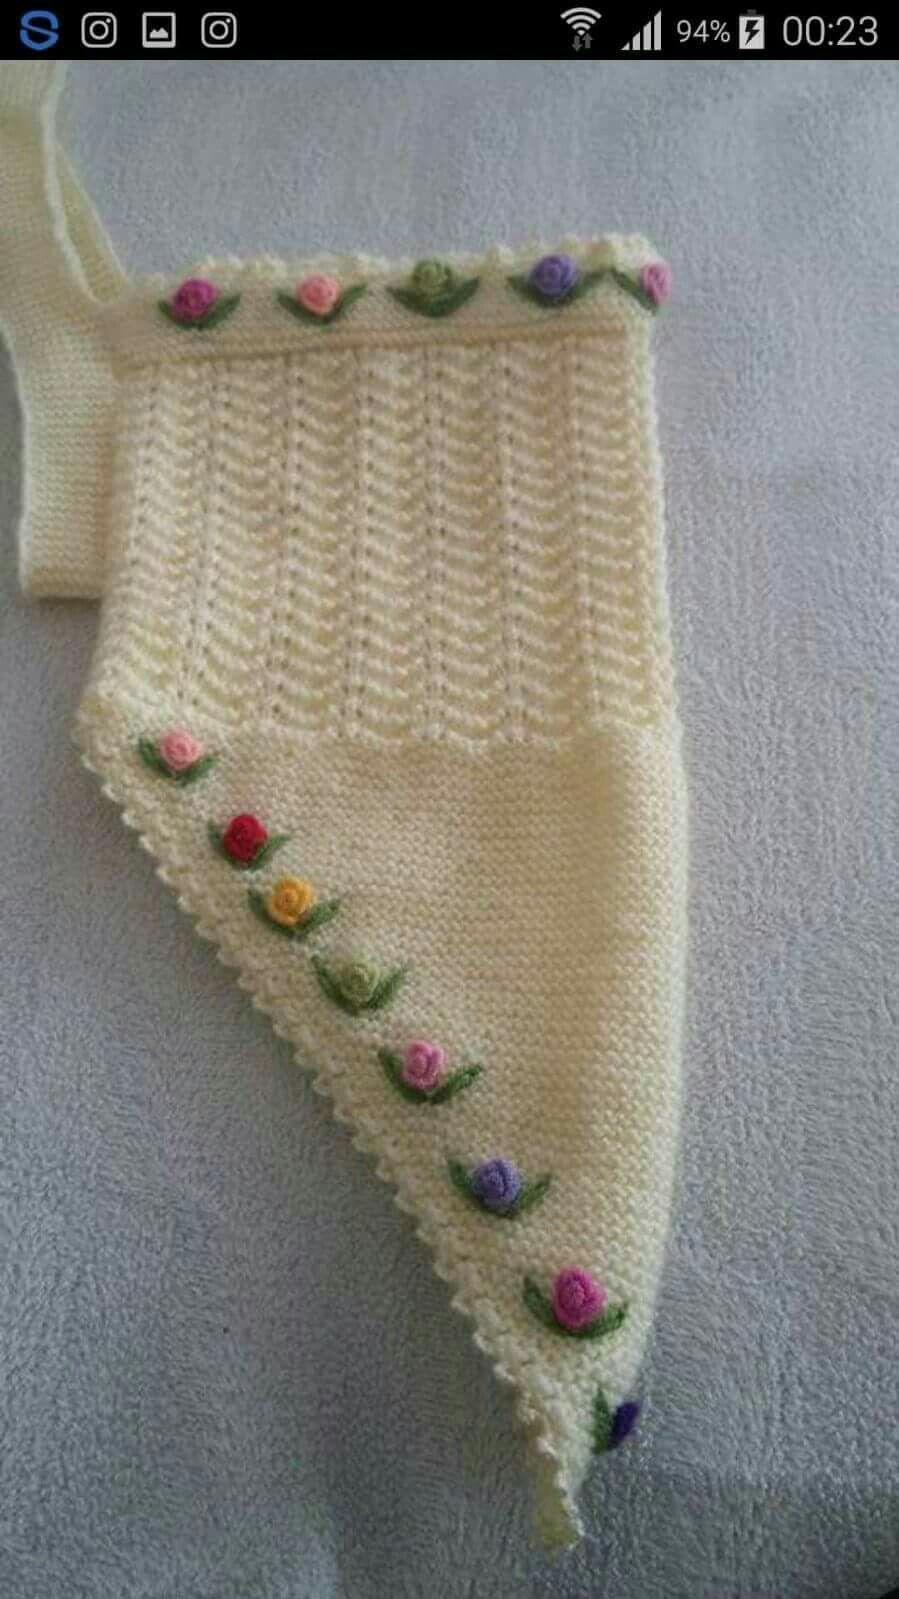 Pin by on pinterest dolls knit baby patterns knitting patterns baby fabric knitting tutorials knitted baby baby knitting tunisian crochet knit crochet crochet baby bankloansurffo Gallery